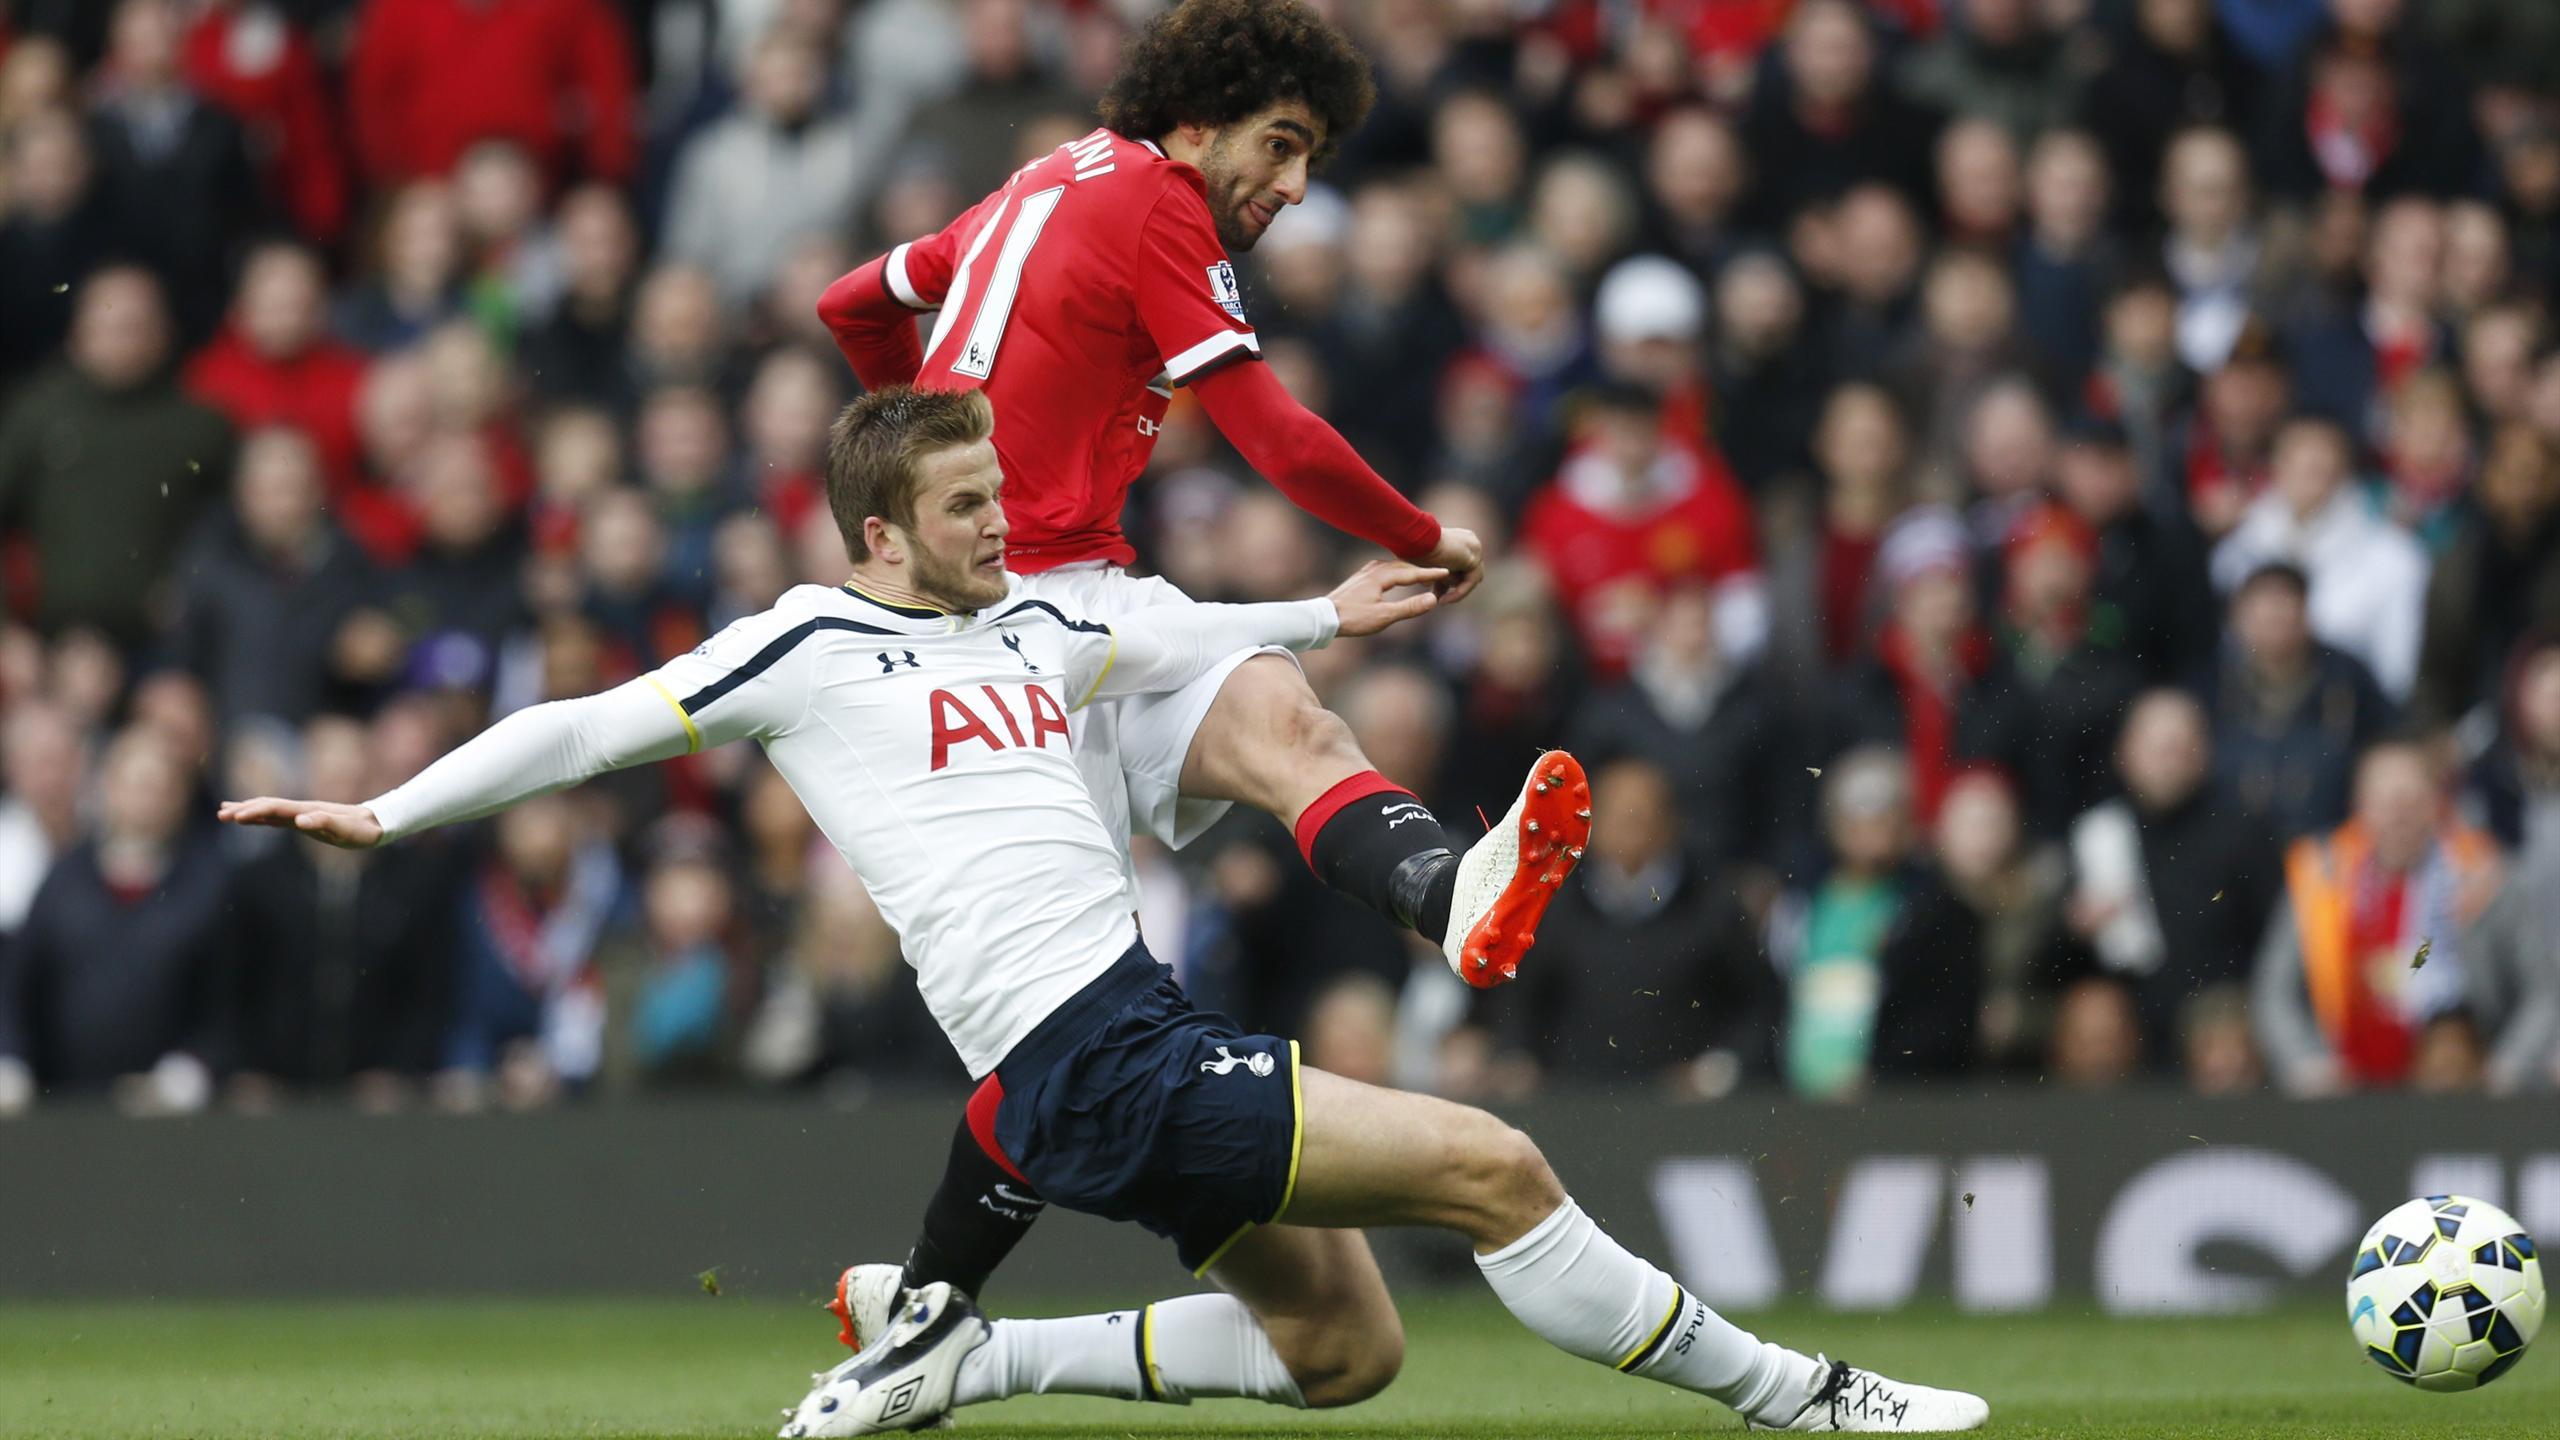 Marouane Fellaini scores Manchester United's opening goal against Tottenham (Reuters)